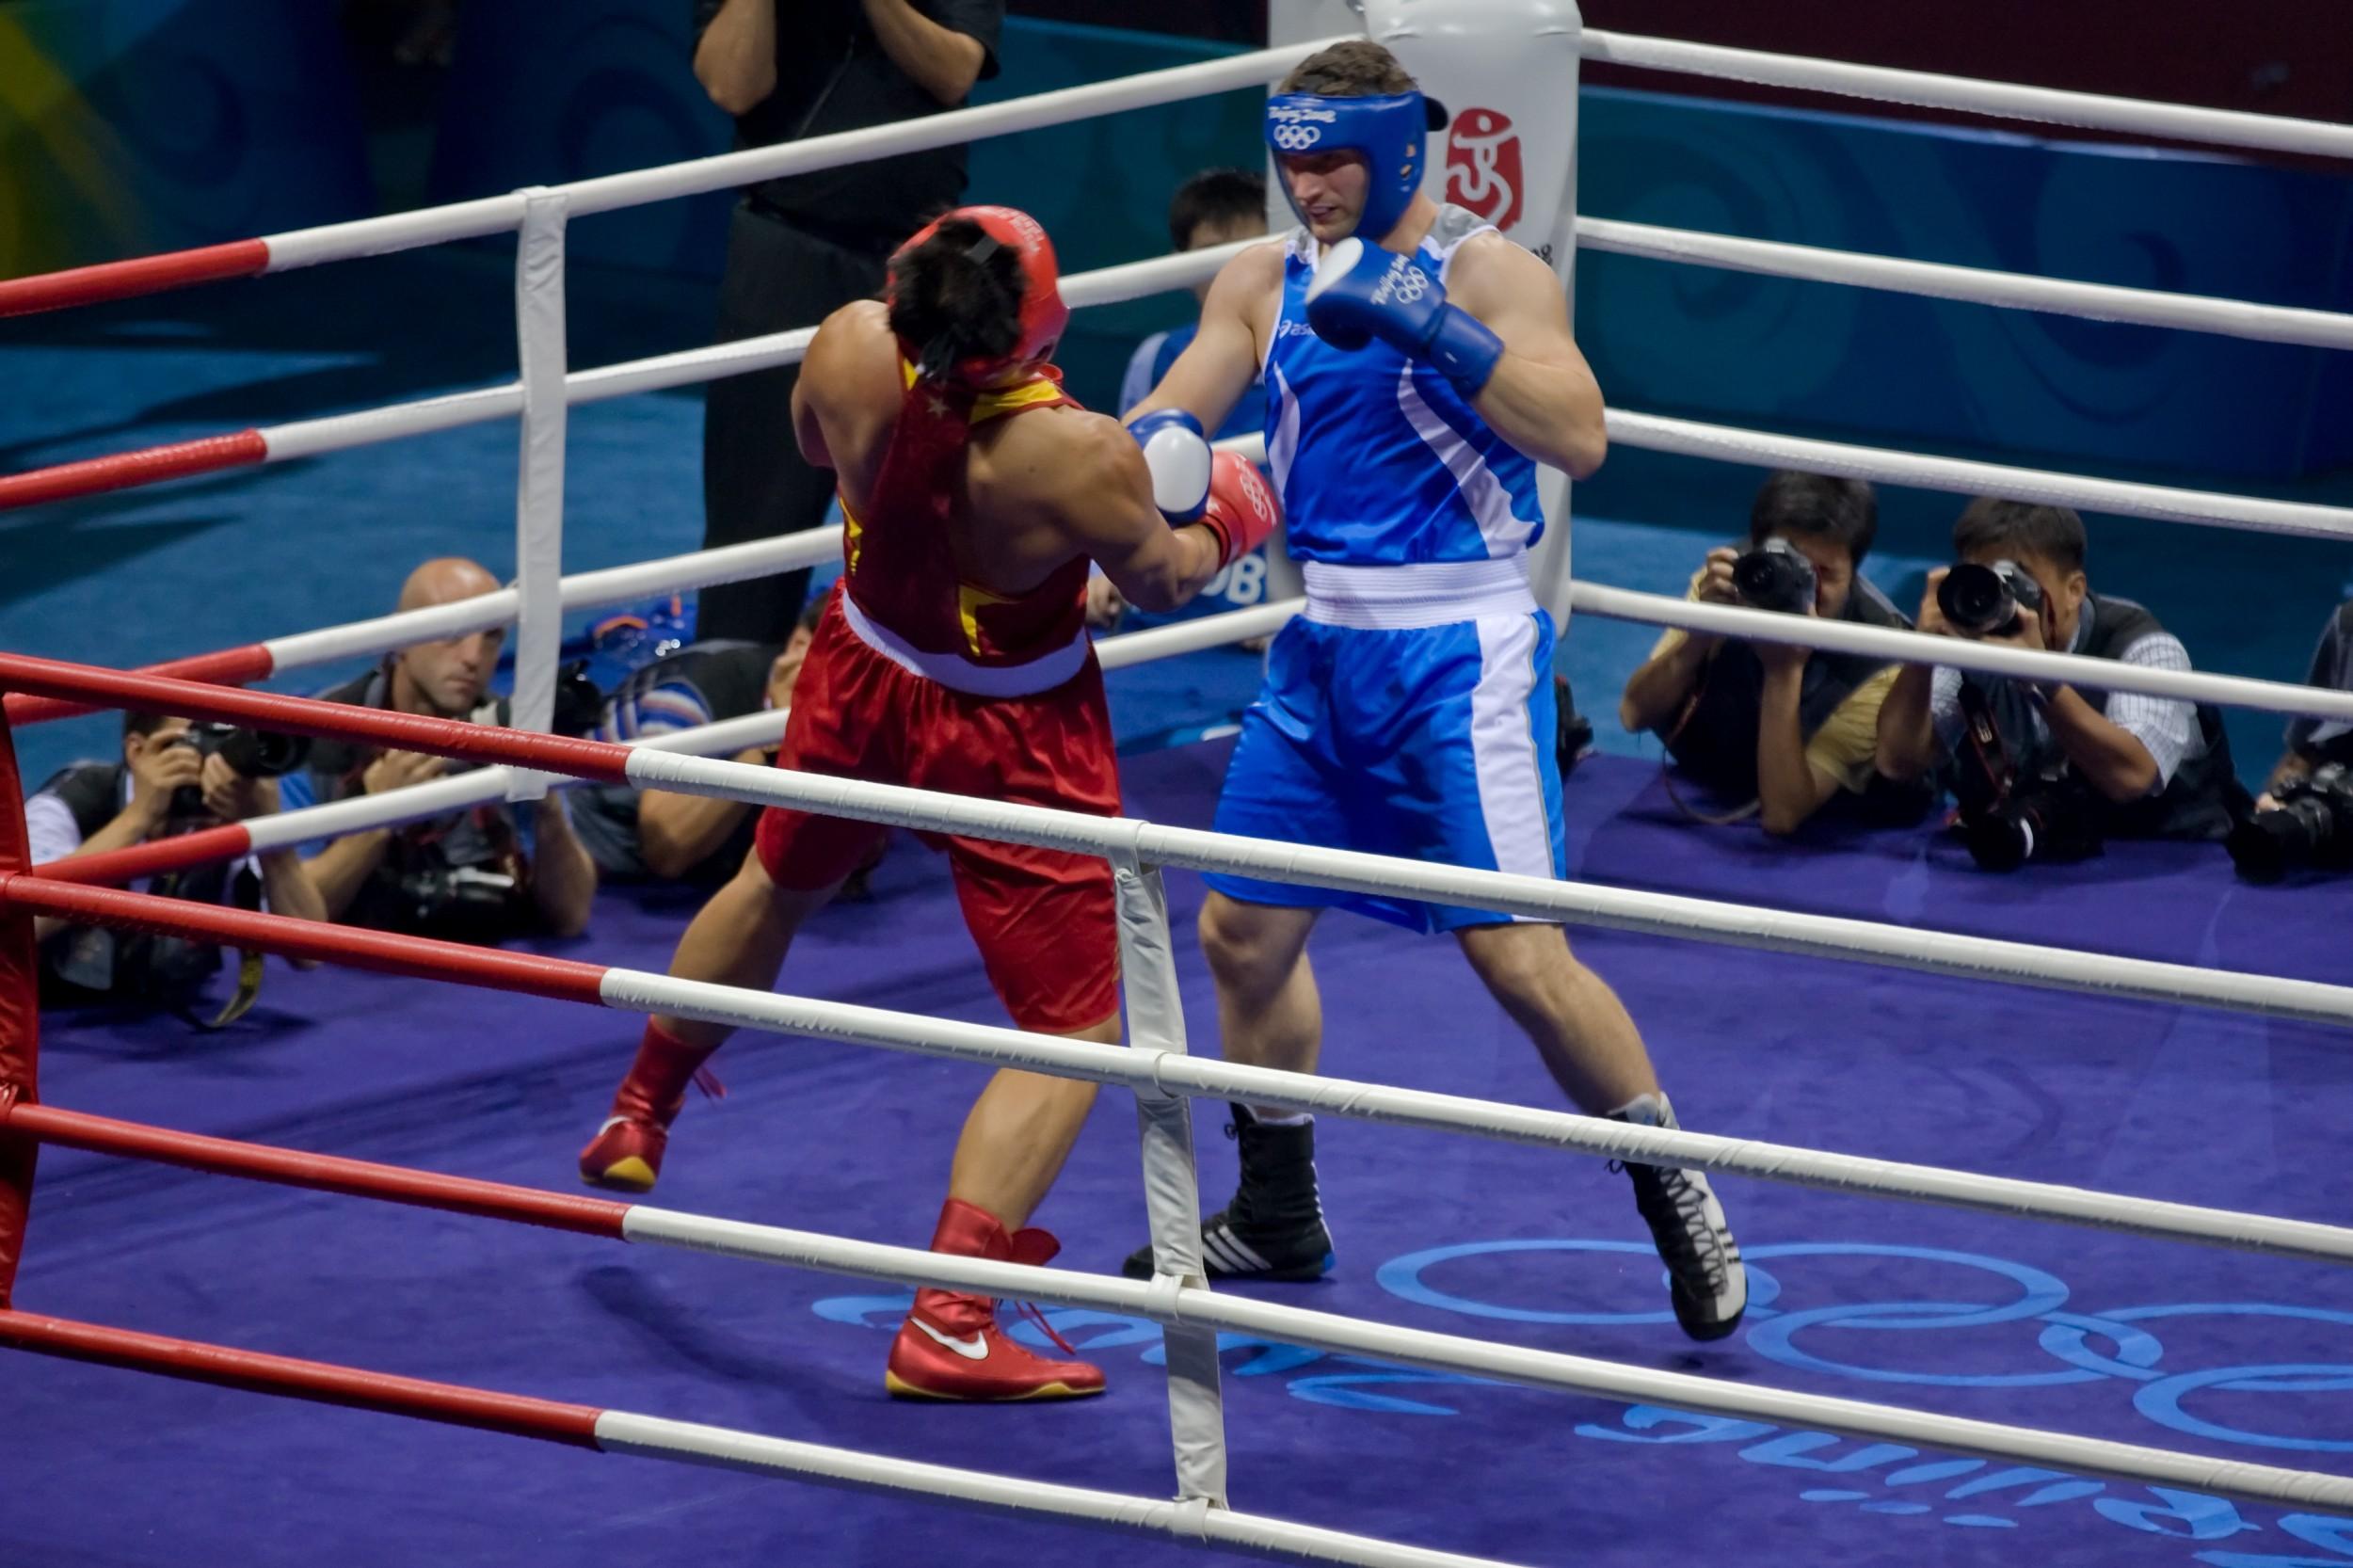 689e1381e Esporte  Boxe. Foto  Pete Niesen   Shutterstock.com